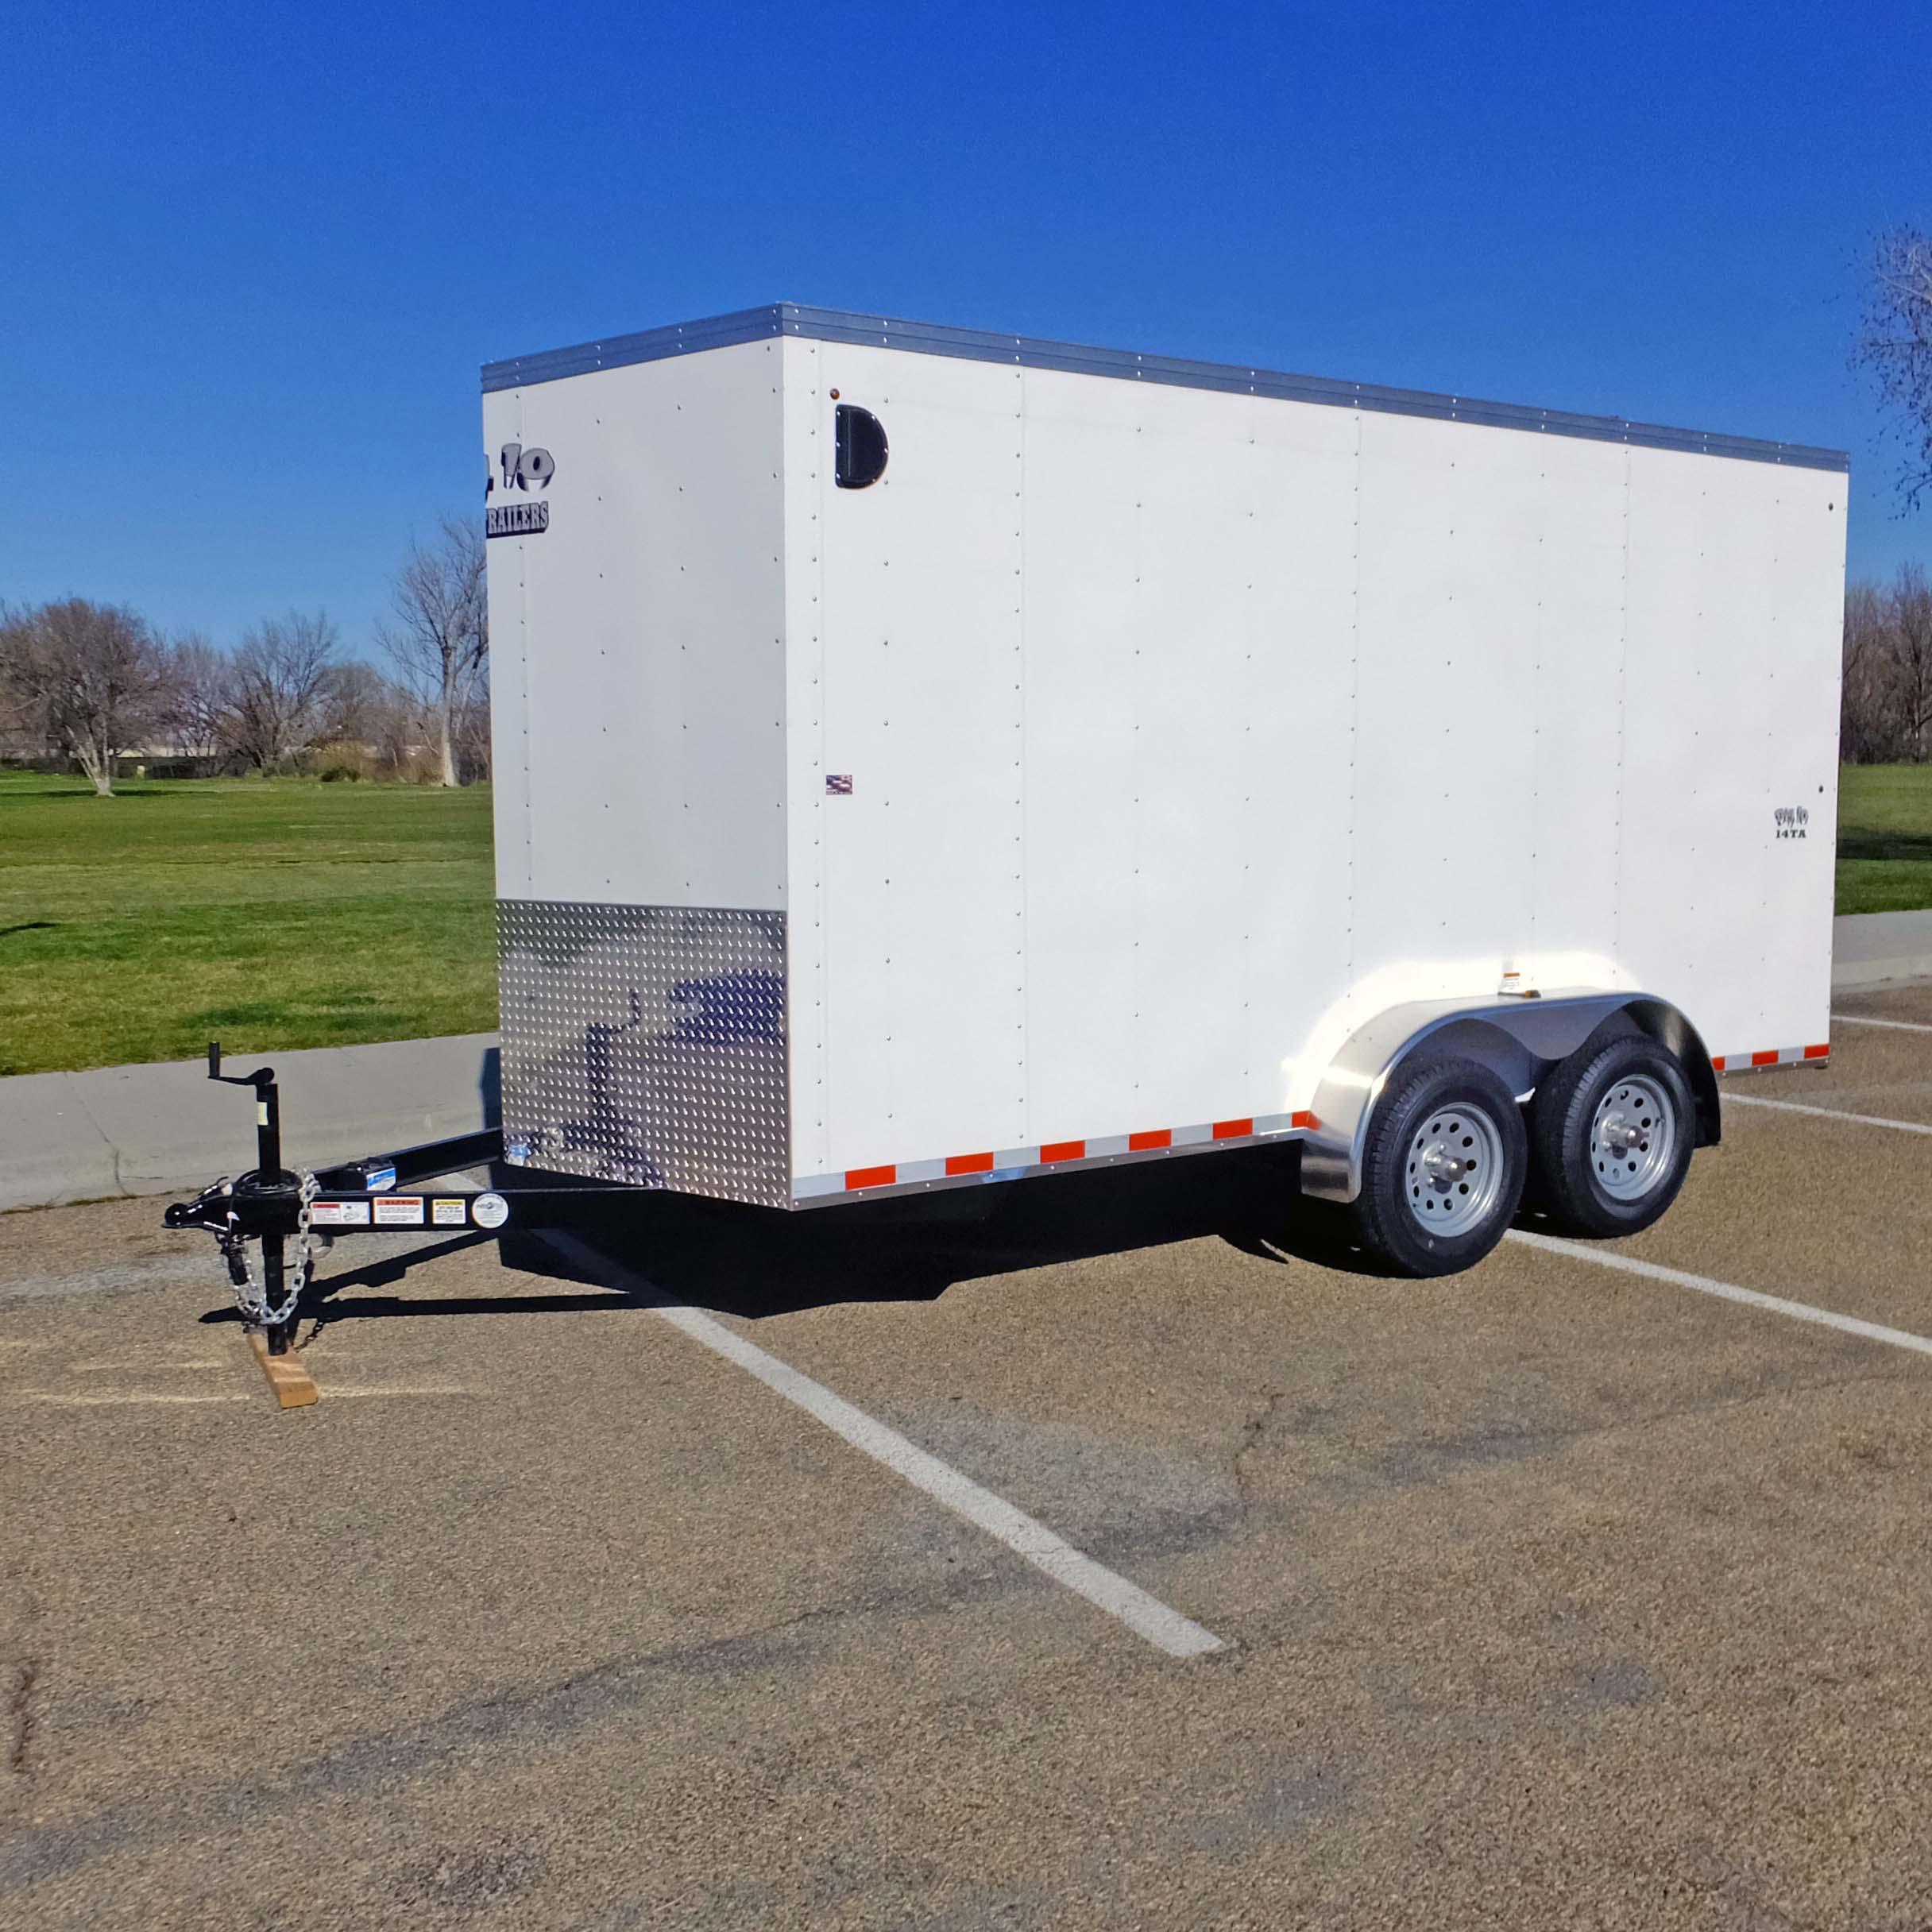 Single Axle Tandem : Big trailers tandem axle cargo